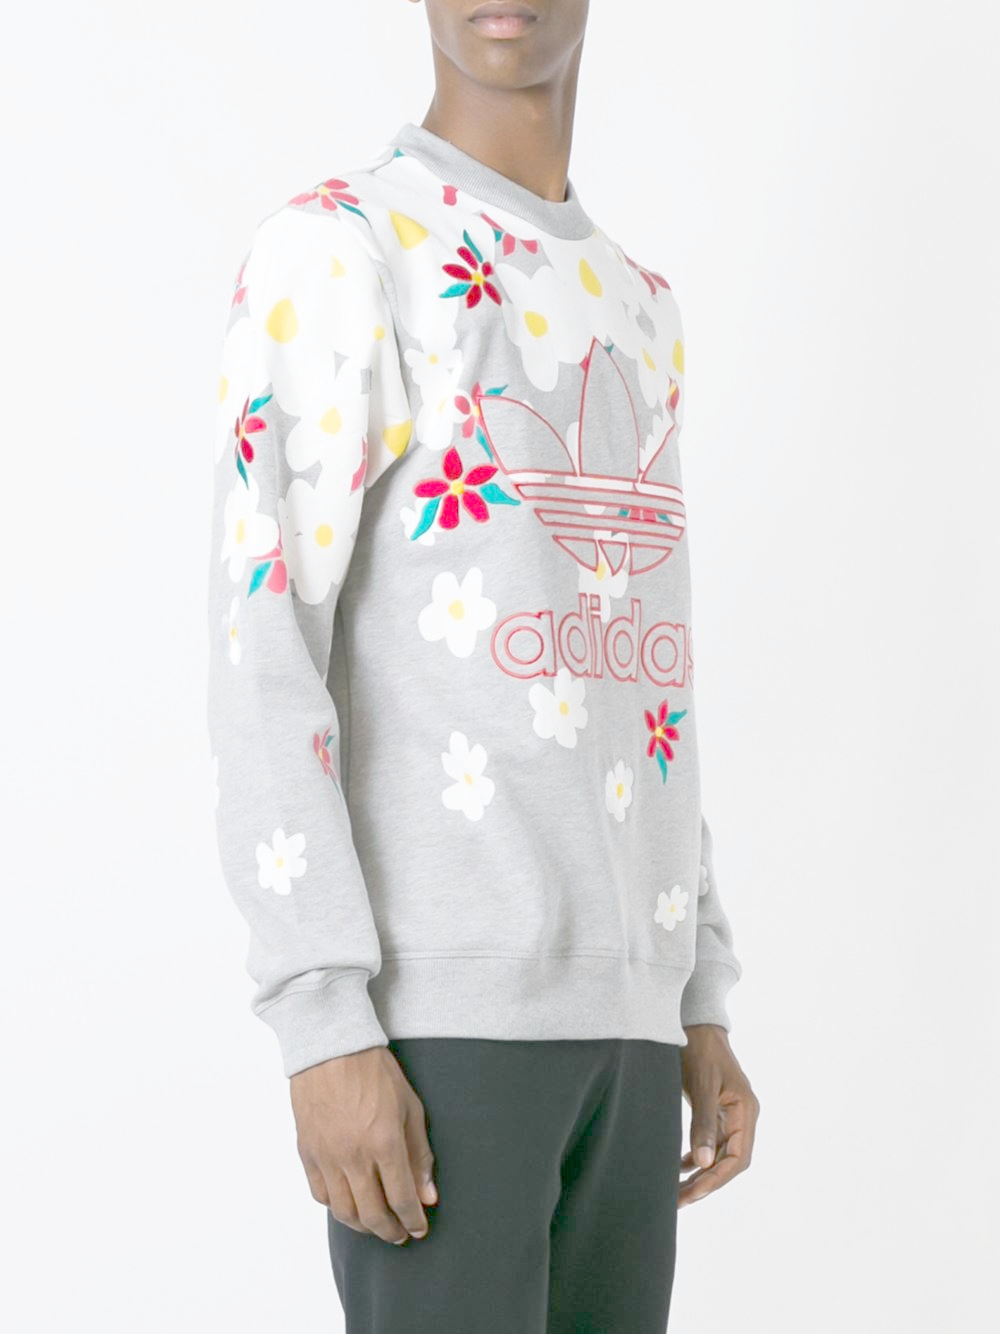 adidas Originals Cotton X Pharrell 'daisy' Sweatshirt in Grey (Grey) for Men